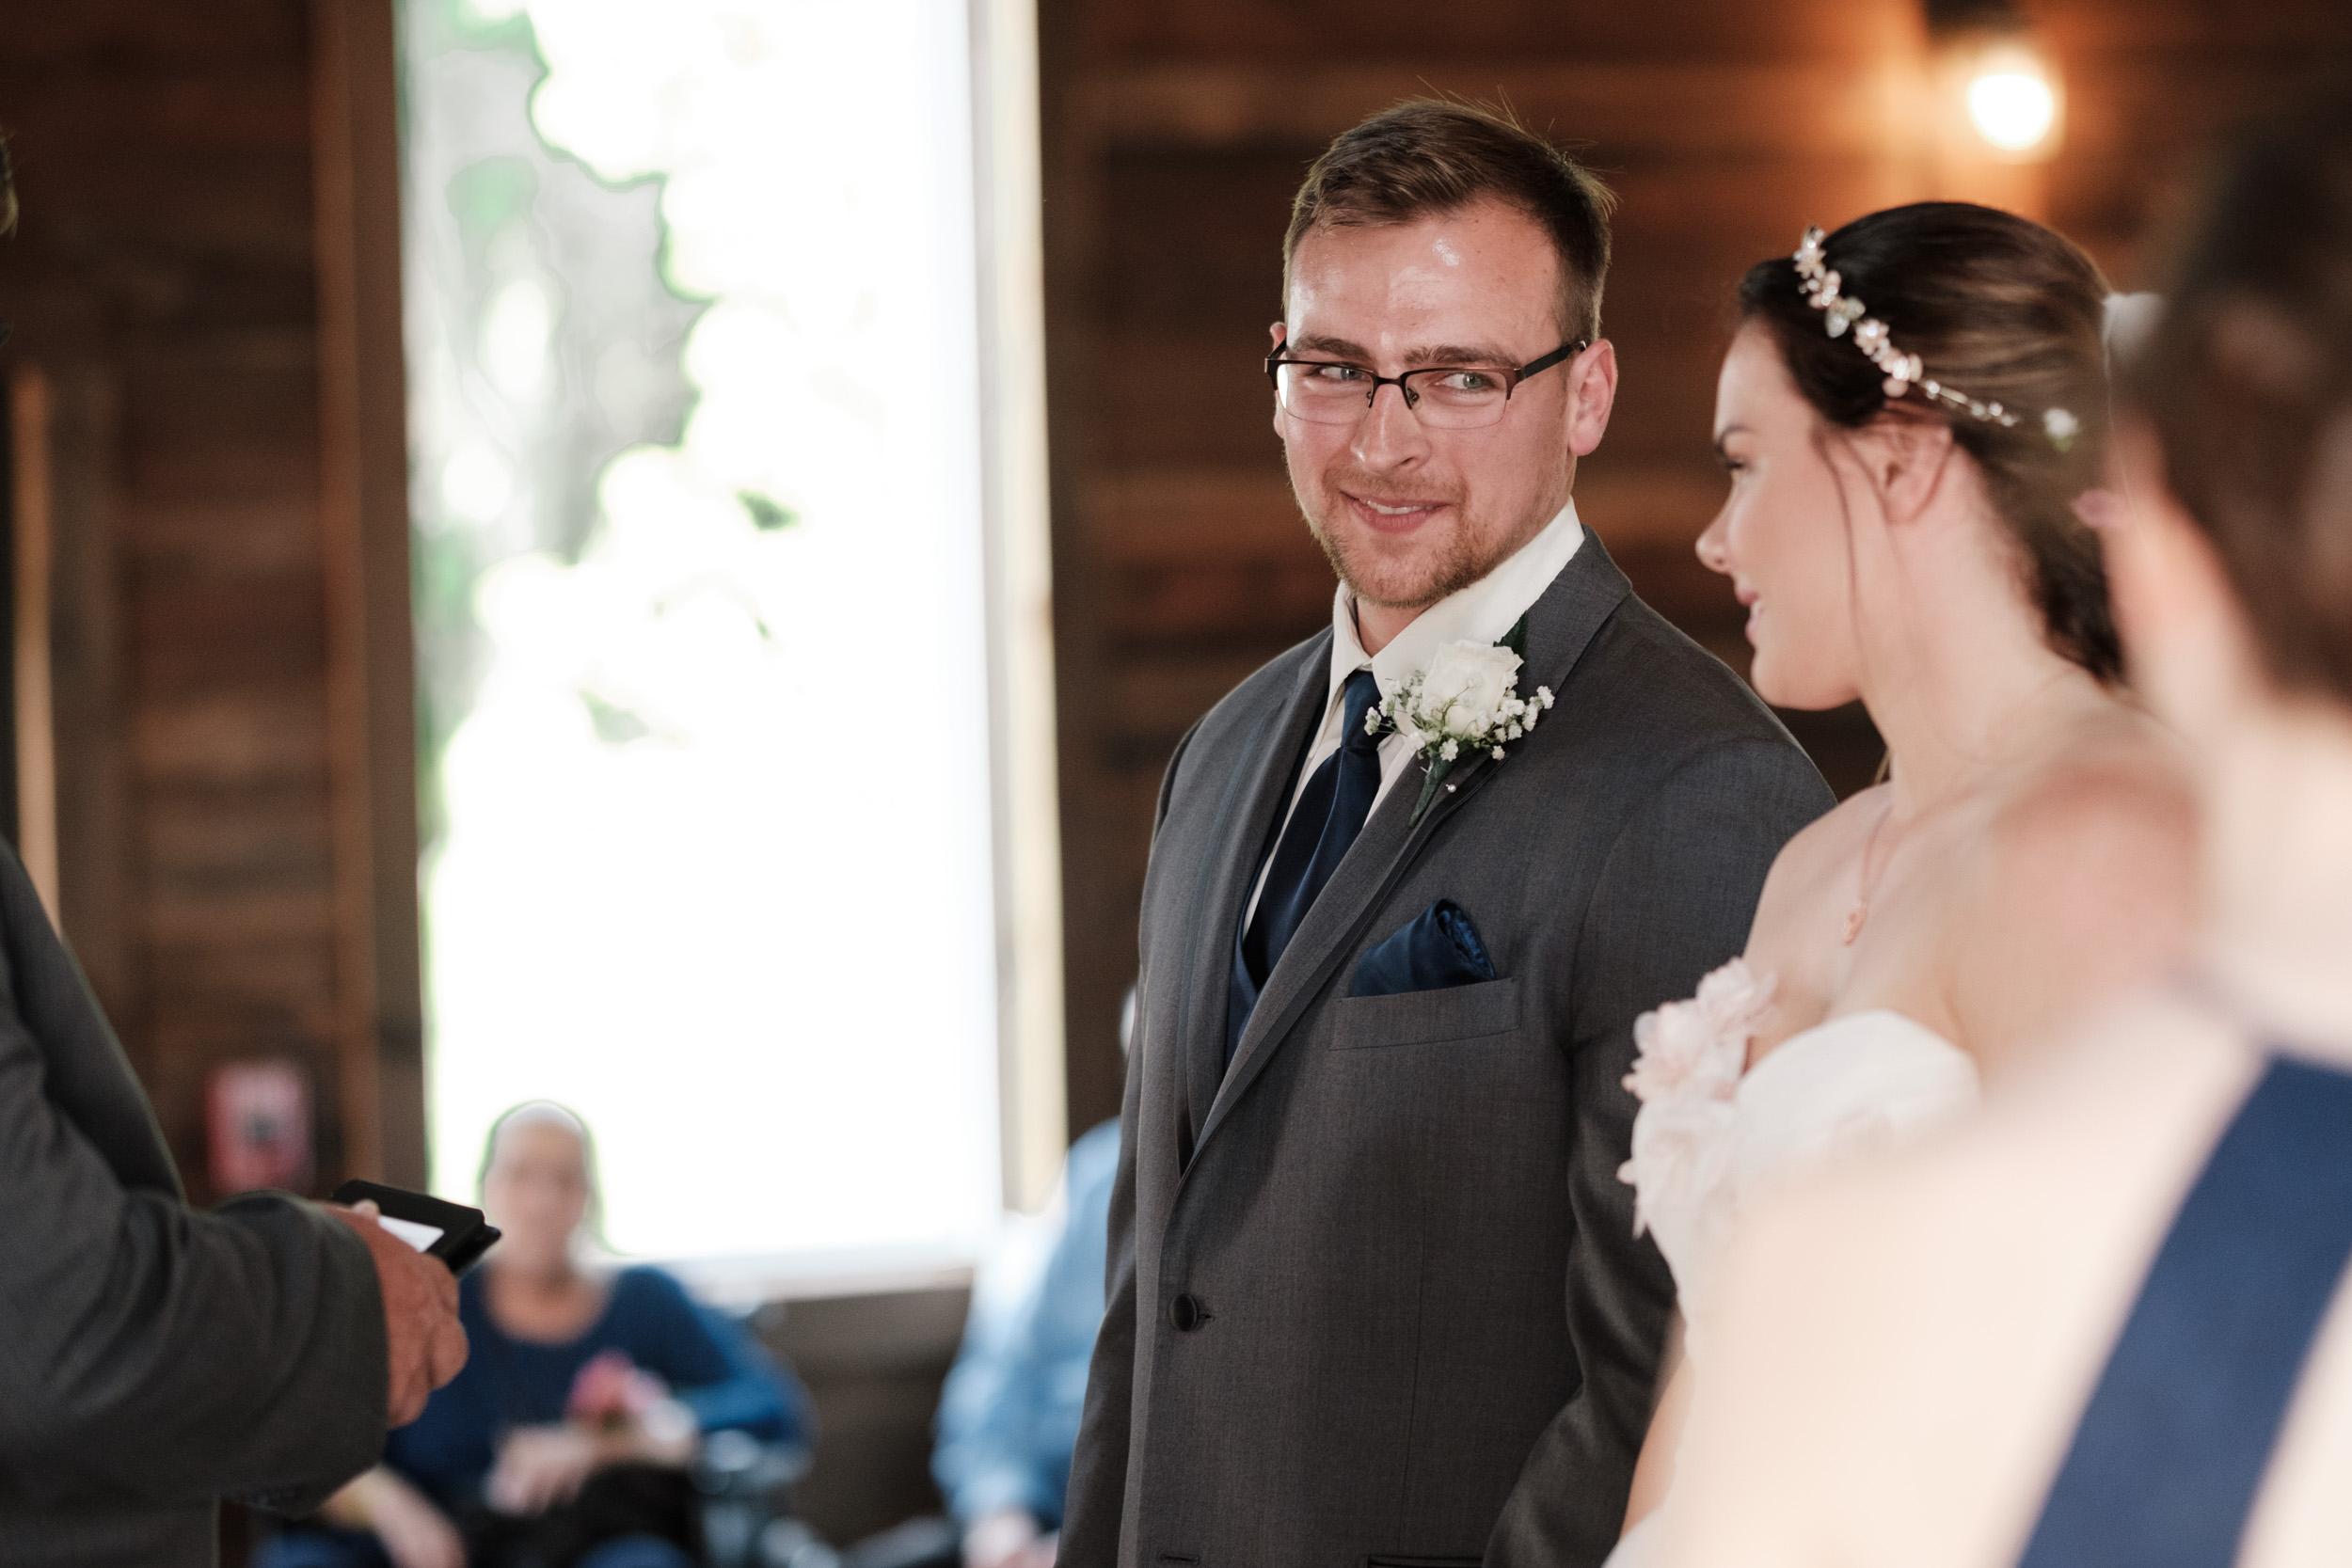 19-06-22-Ryan-Katie-The-Fields-Reserve-Wedding-24.jpg